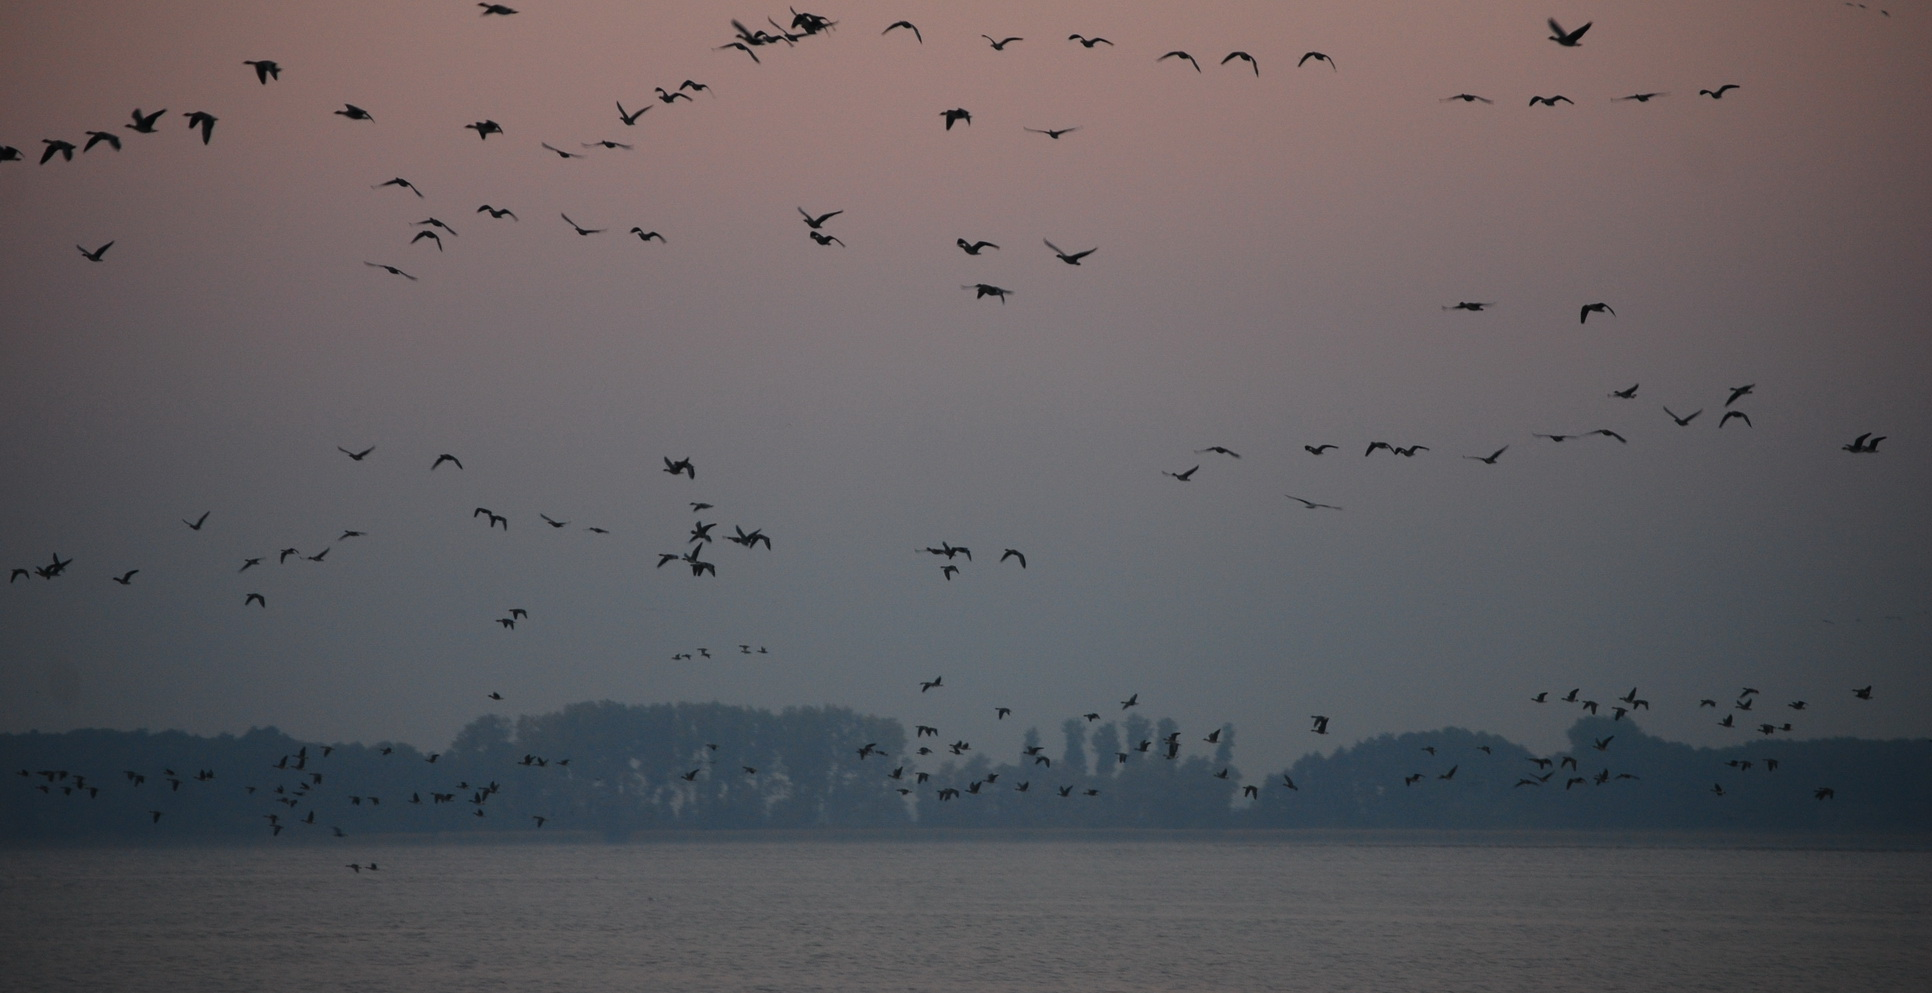 Waterbirds at Lake Arendsee